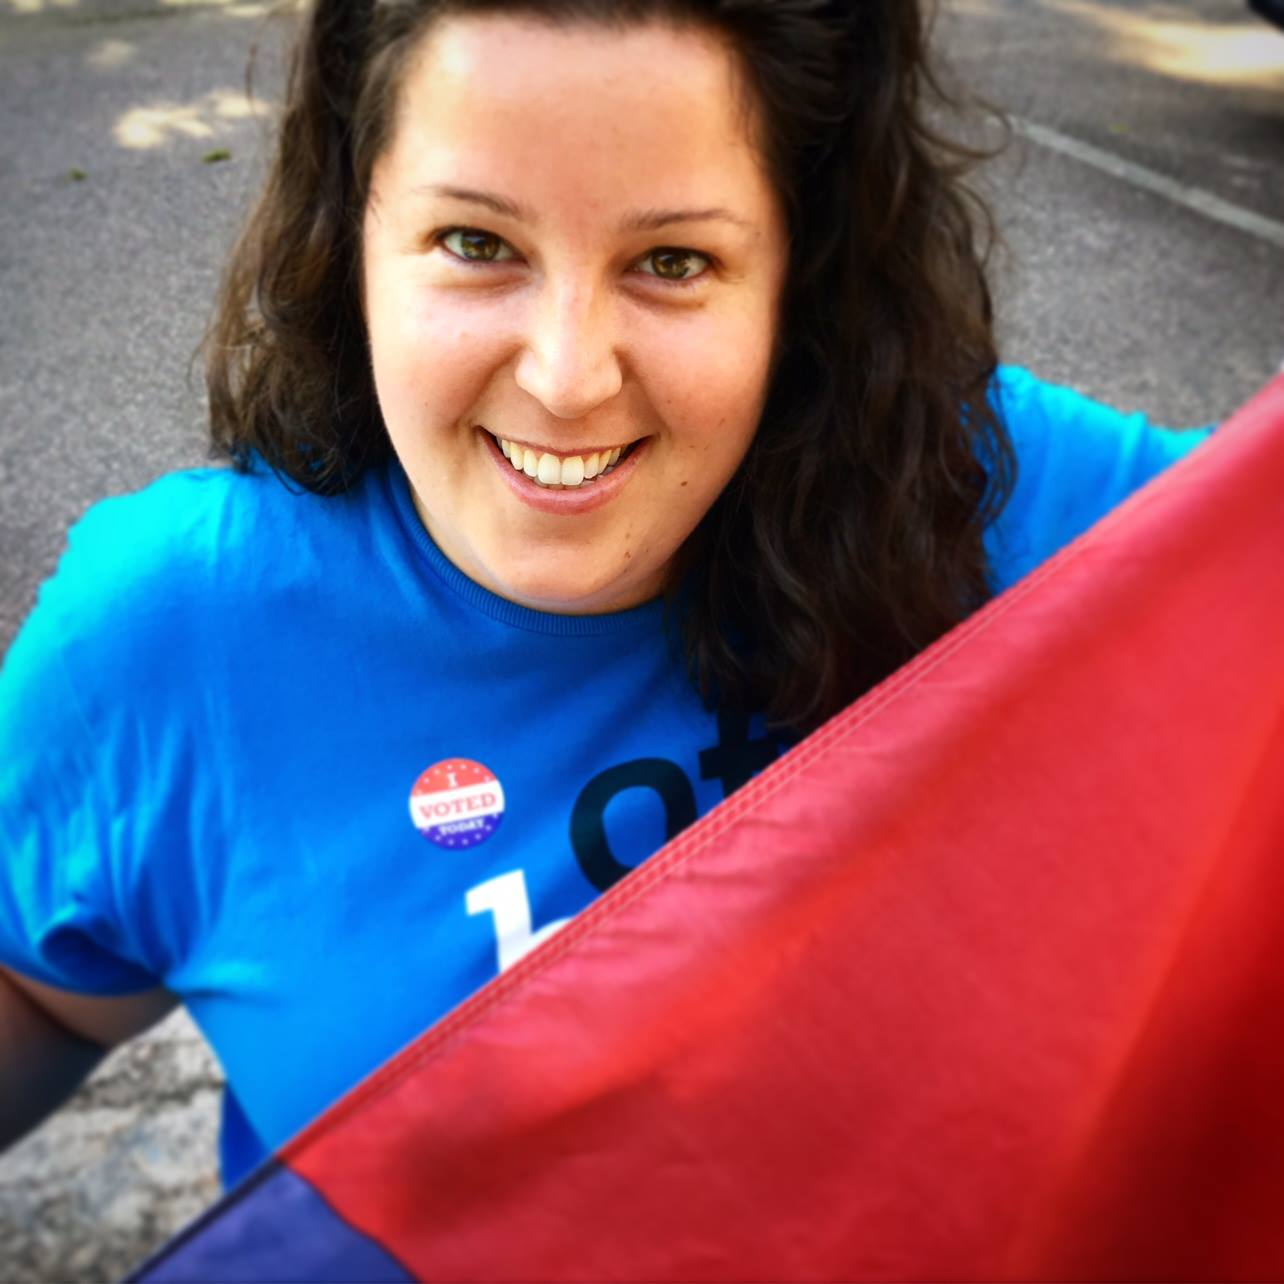 Caitlin Metzguer - Caitlin@YouCanVote.org